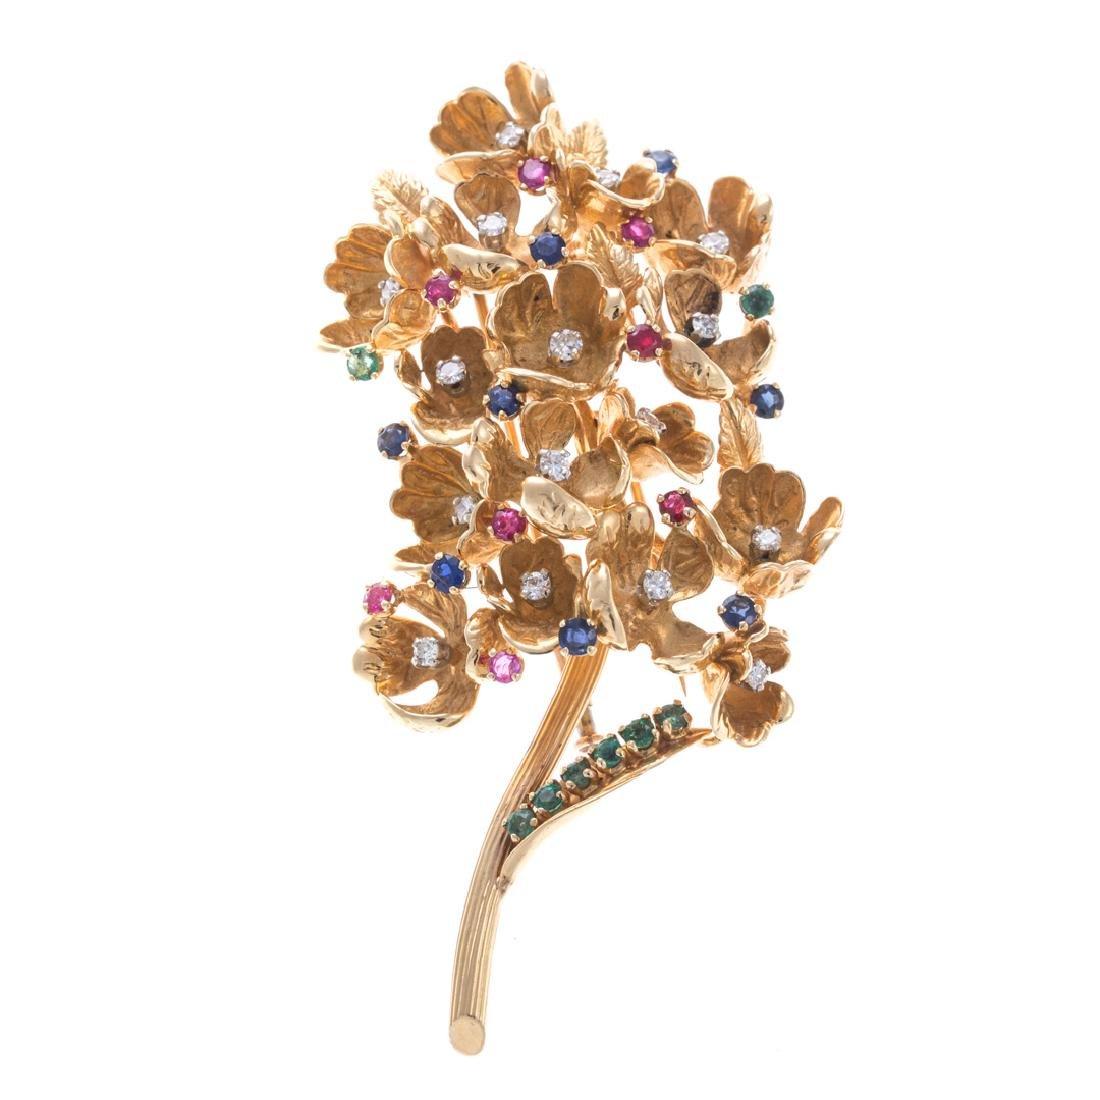 A Charming French Gemstone & Diamond Brooch in 18K